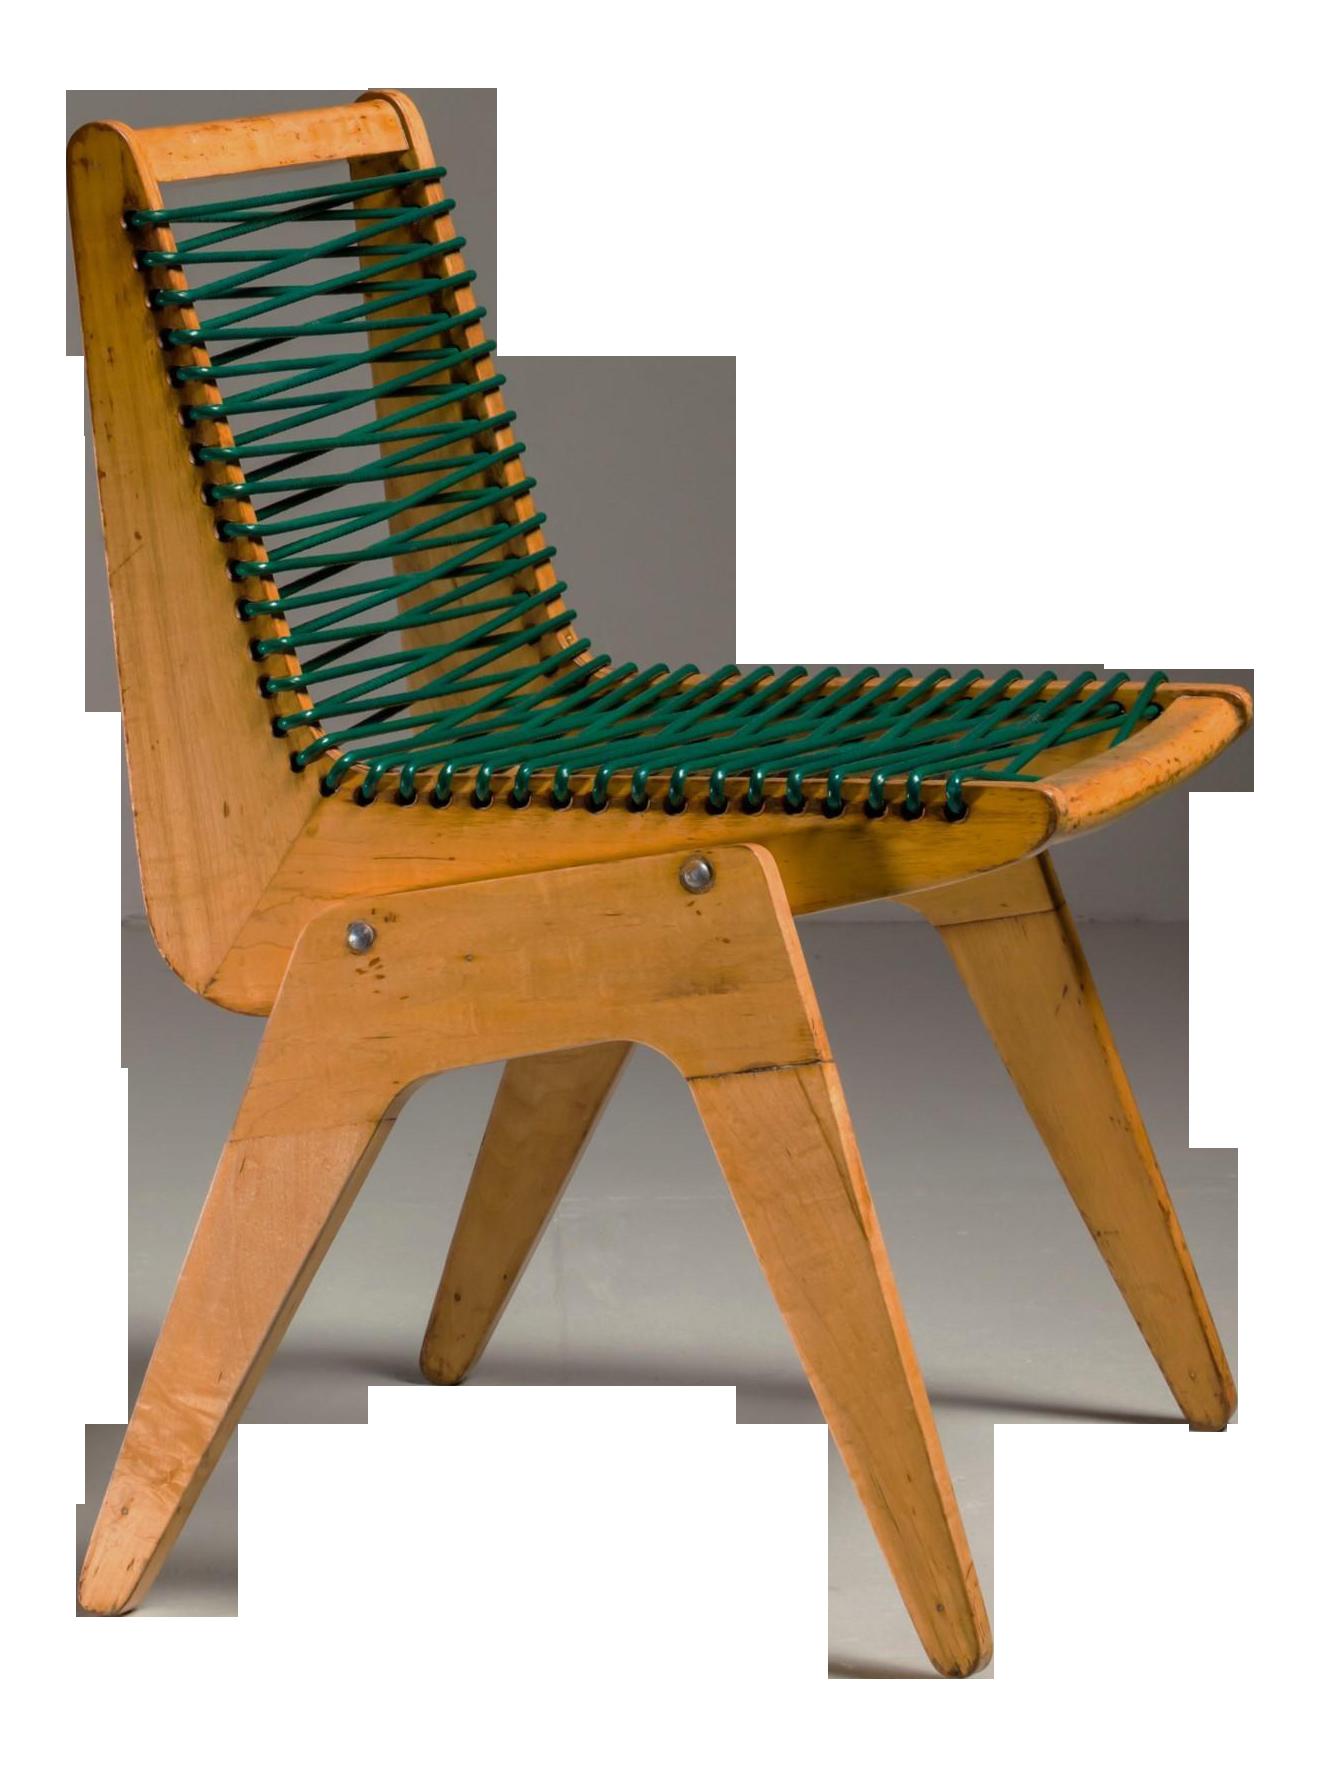 Robert Kayton And Associates Plywood With Woven Cord Chair, US, 1940s    Image 1